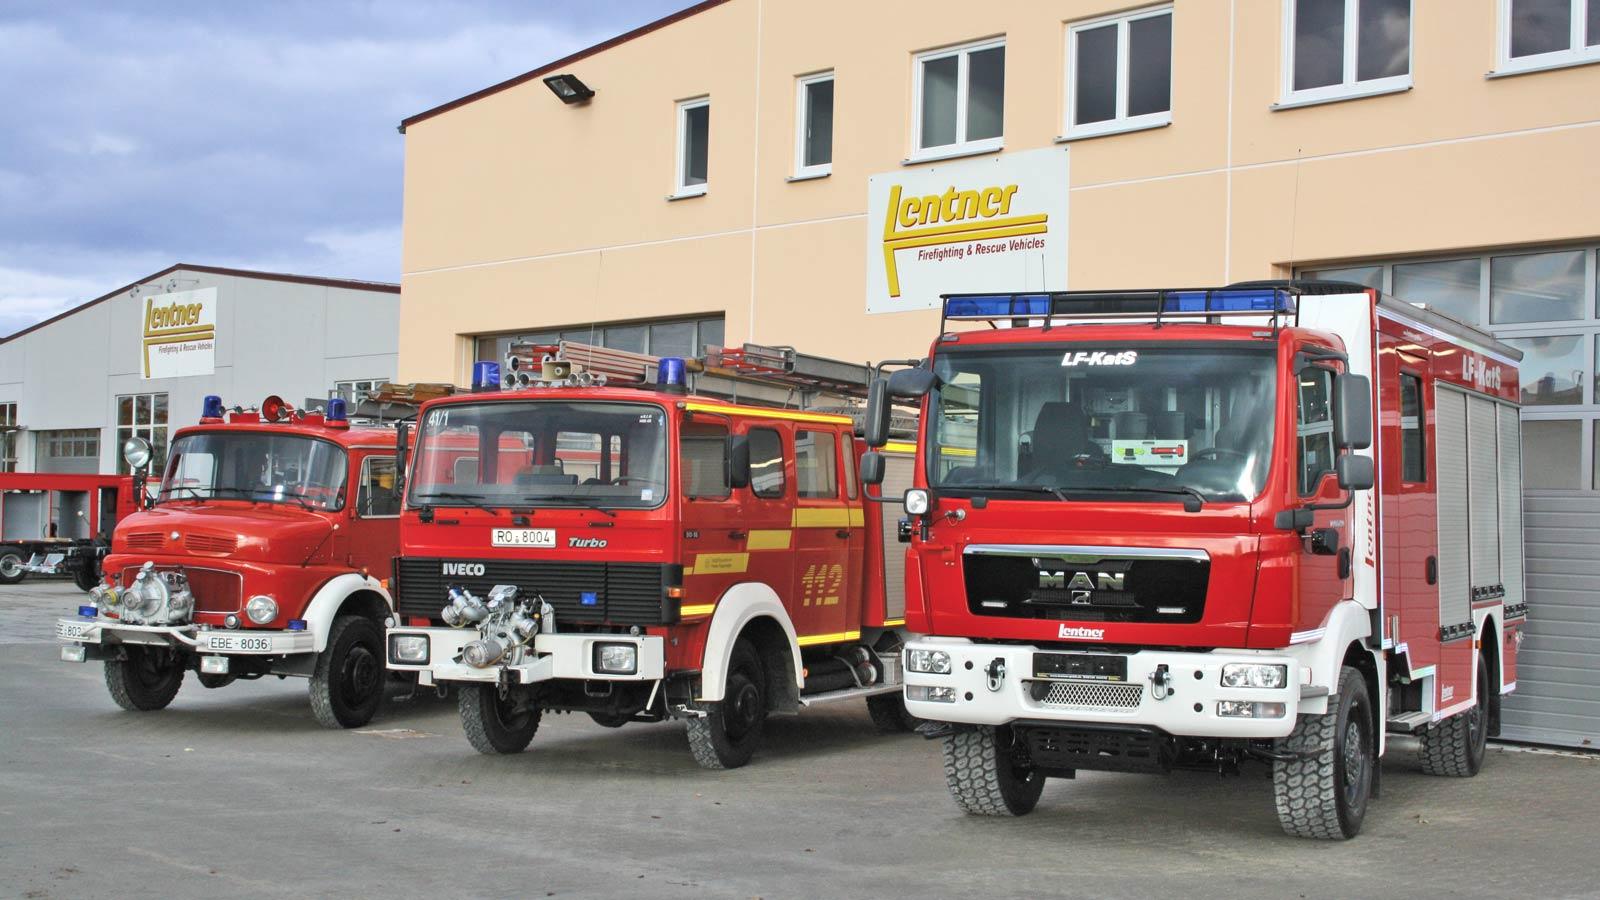 Drei-Generationen-LF-KatS-aus-dem-Hause-Lentner.jpg